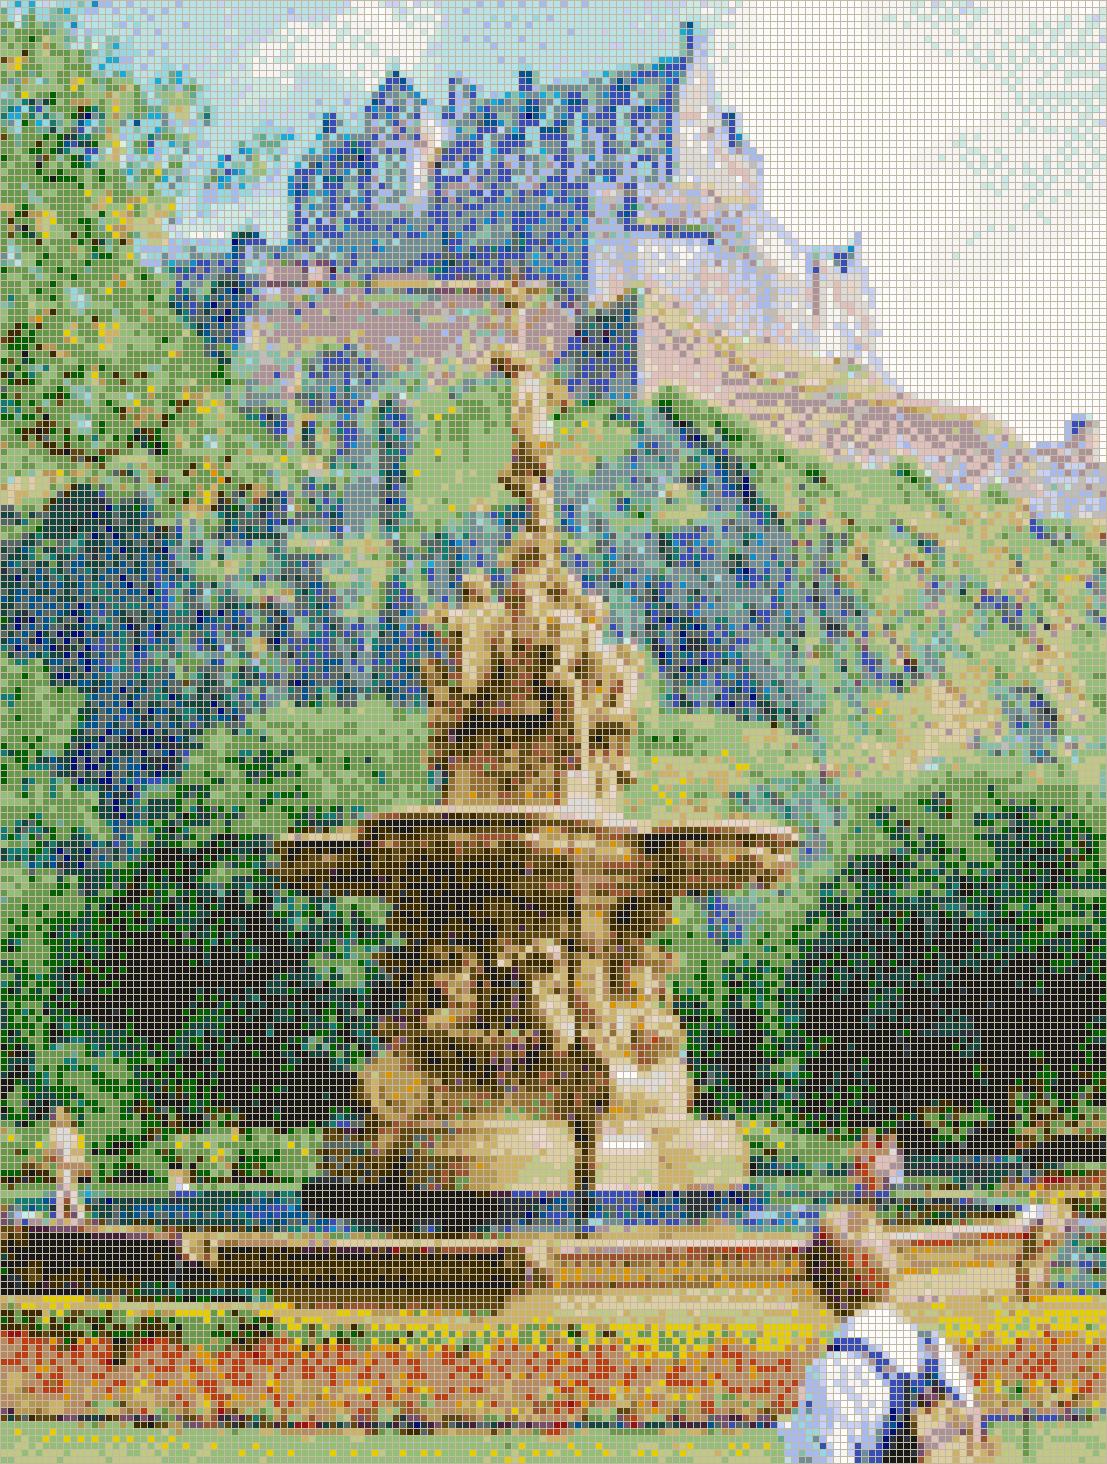 edinburgh castle and fountain - mosaic tile art